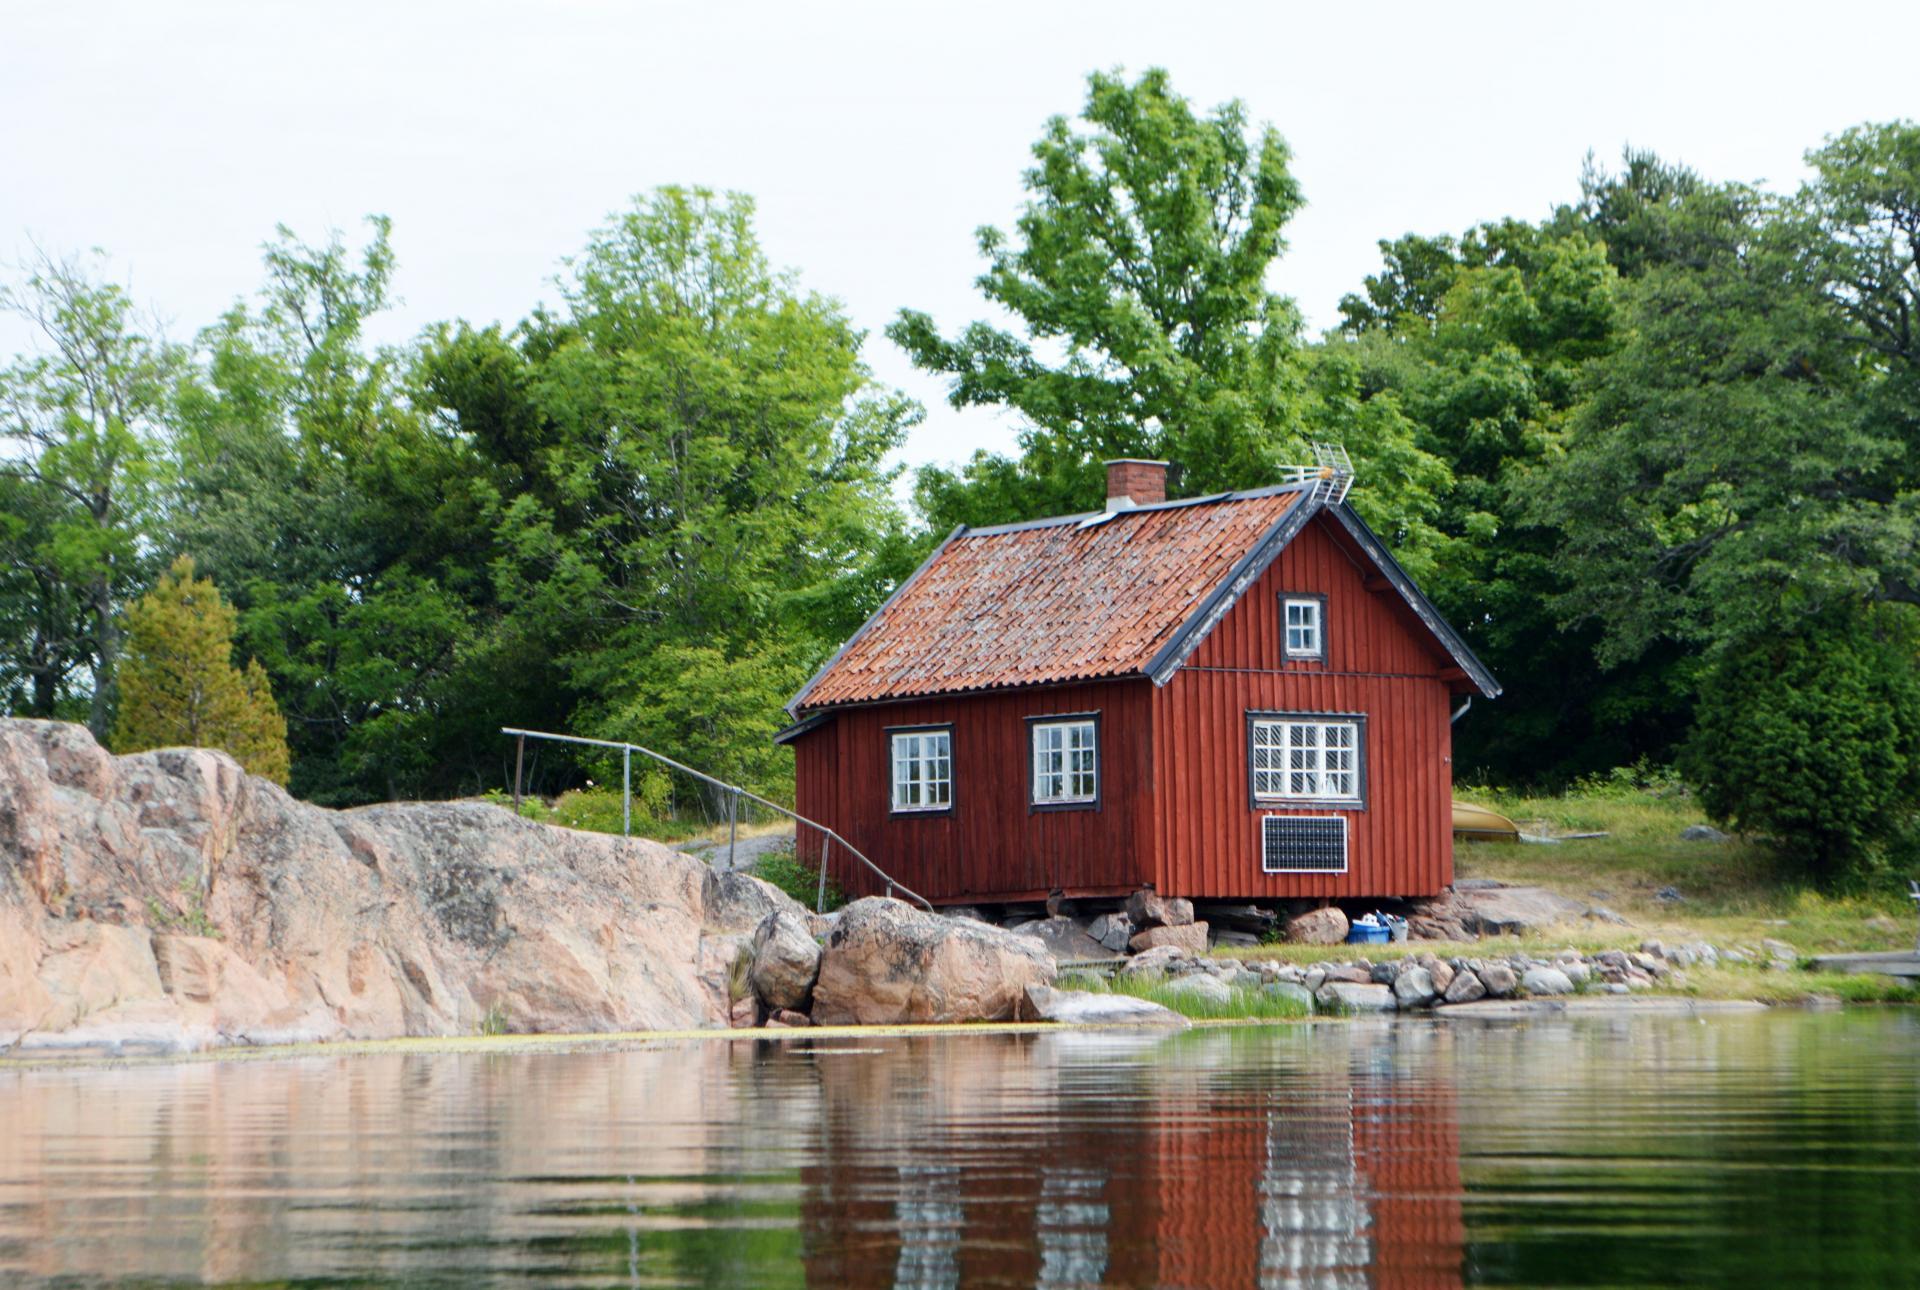 Sormland Sweden travel guide: explore Stockholm archipelago islands the girl outdoors